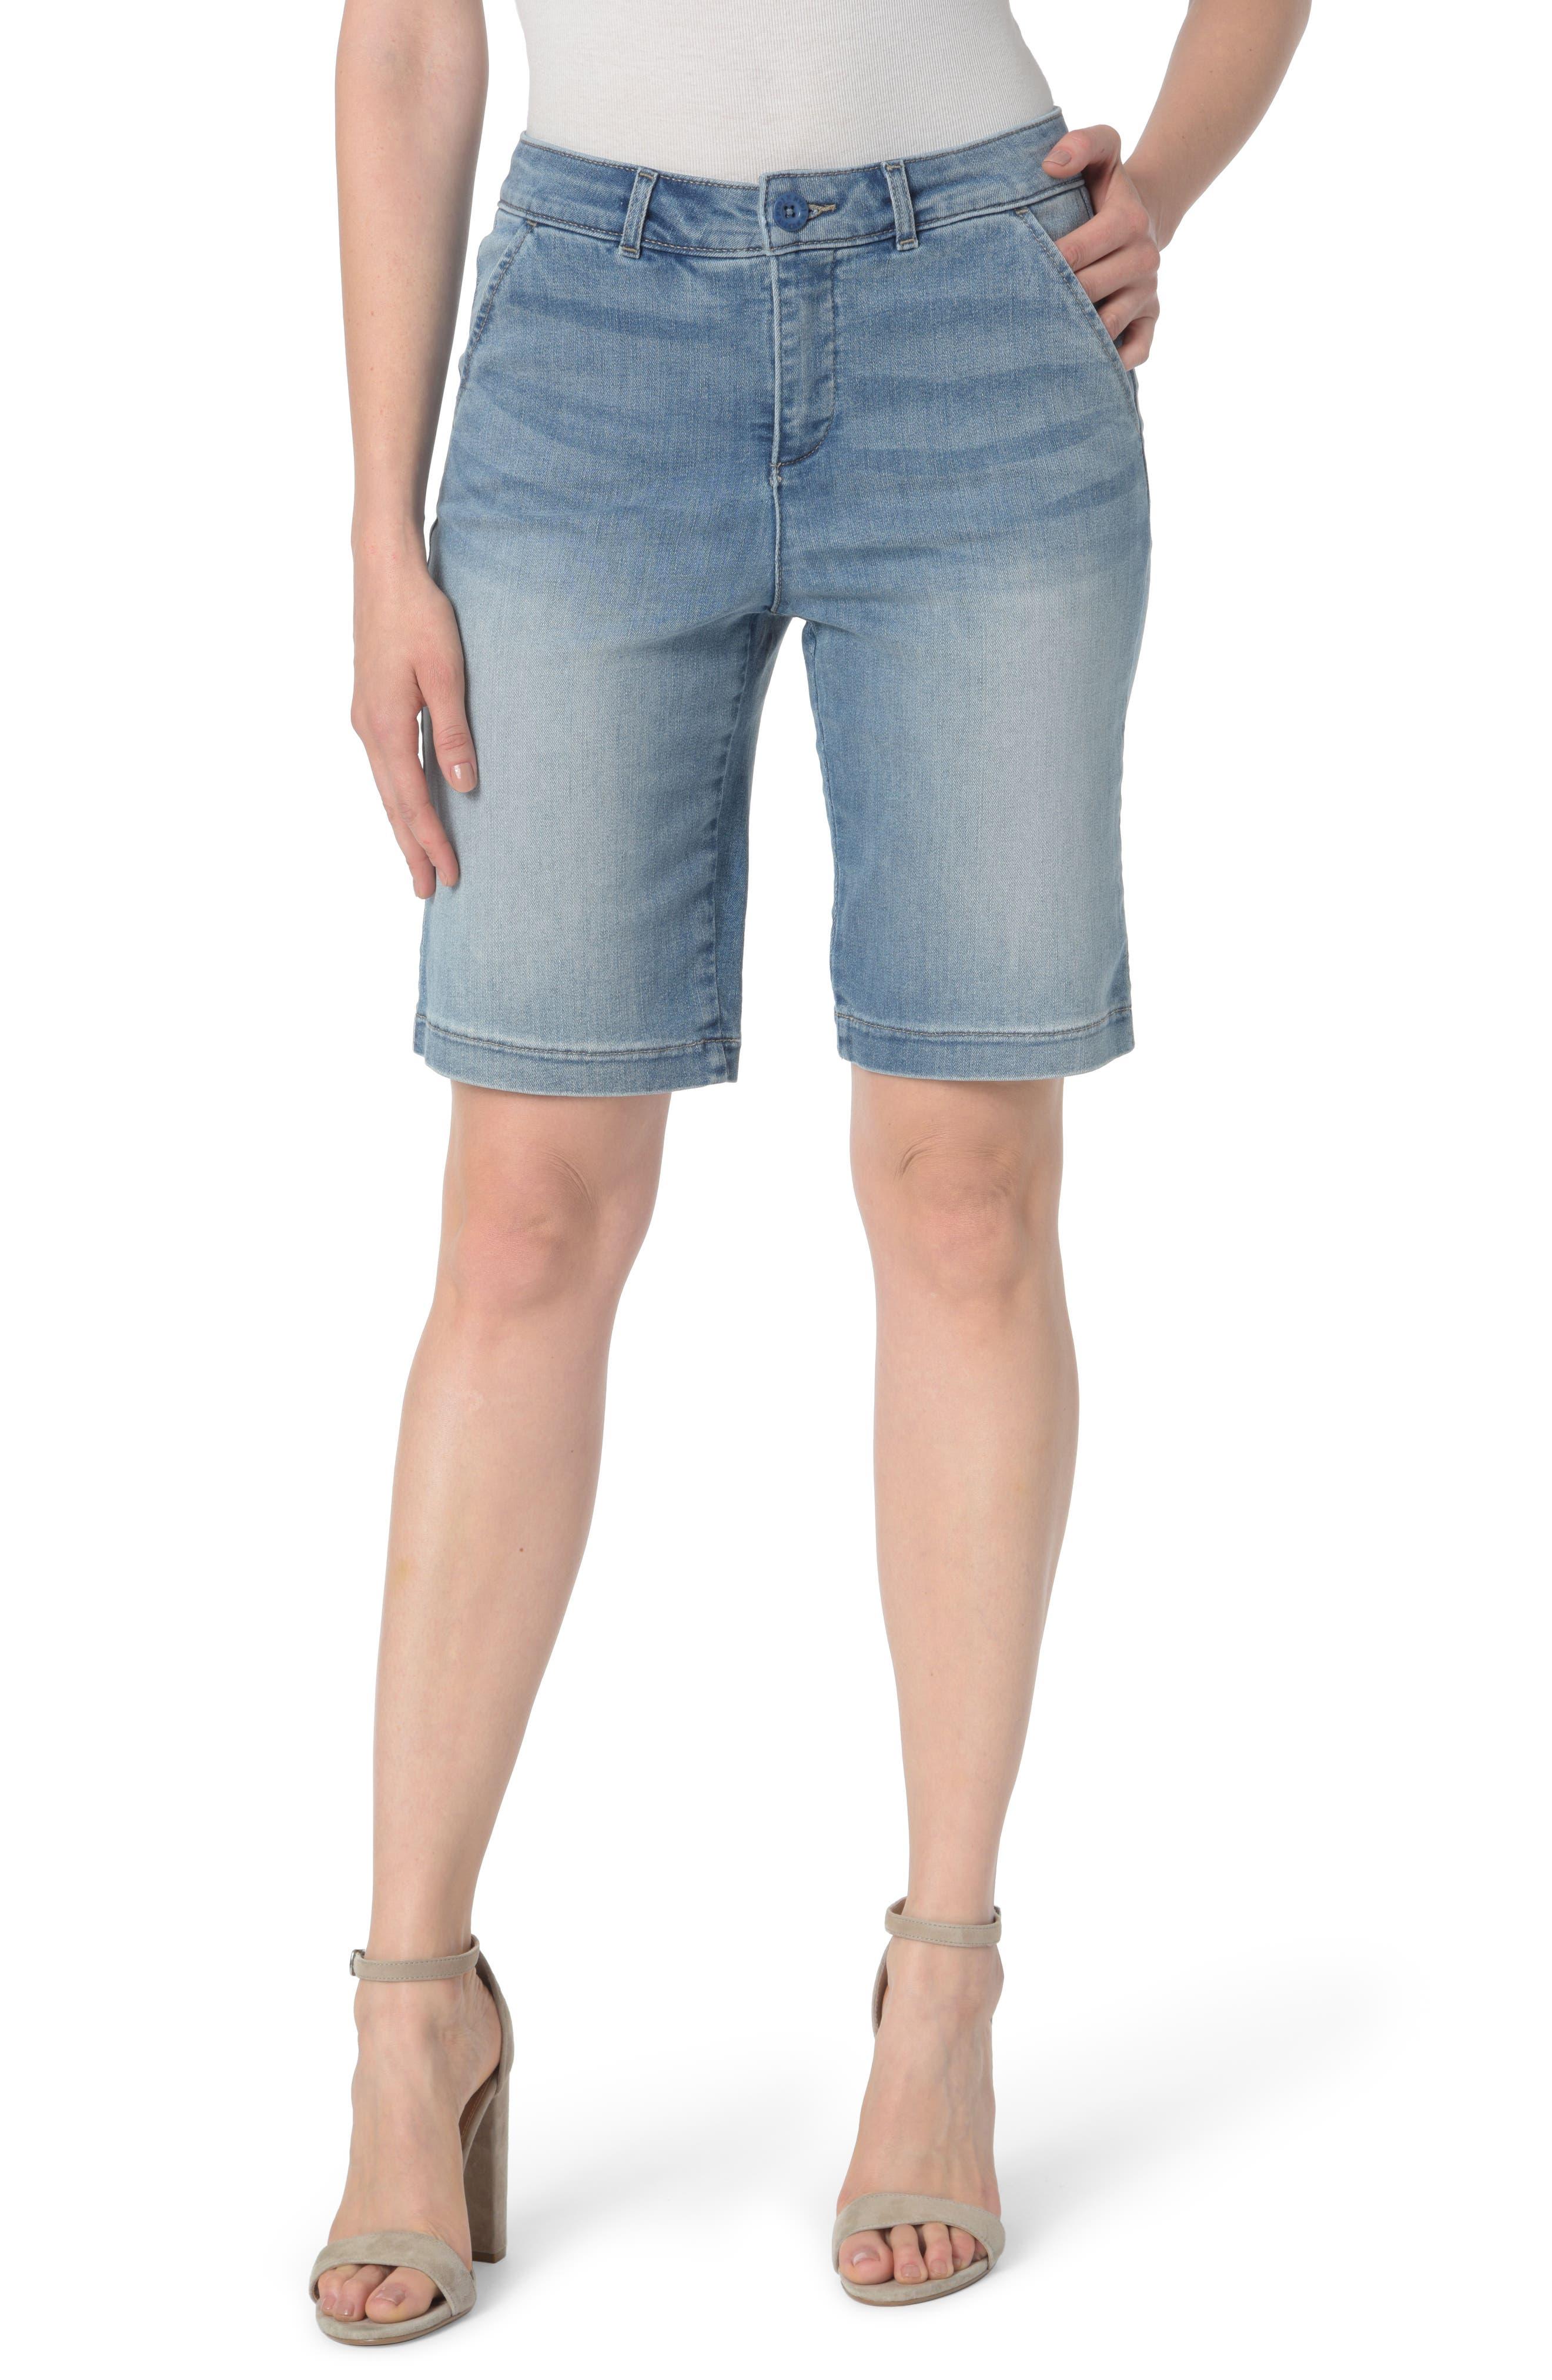 Alternate Image 1 Selected - NYDJ Marilyn Stretch Denim Bermuda Shorts